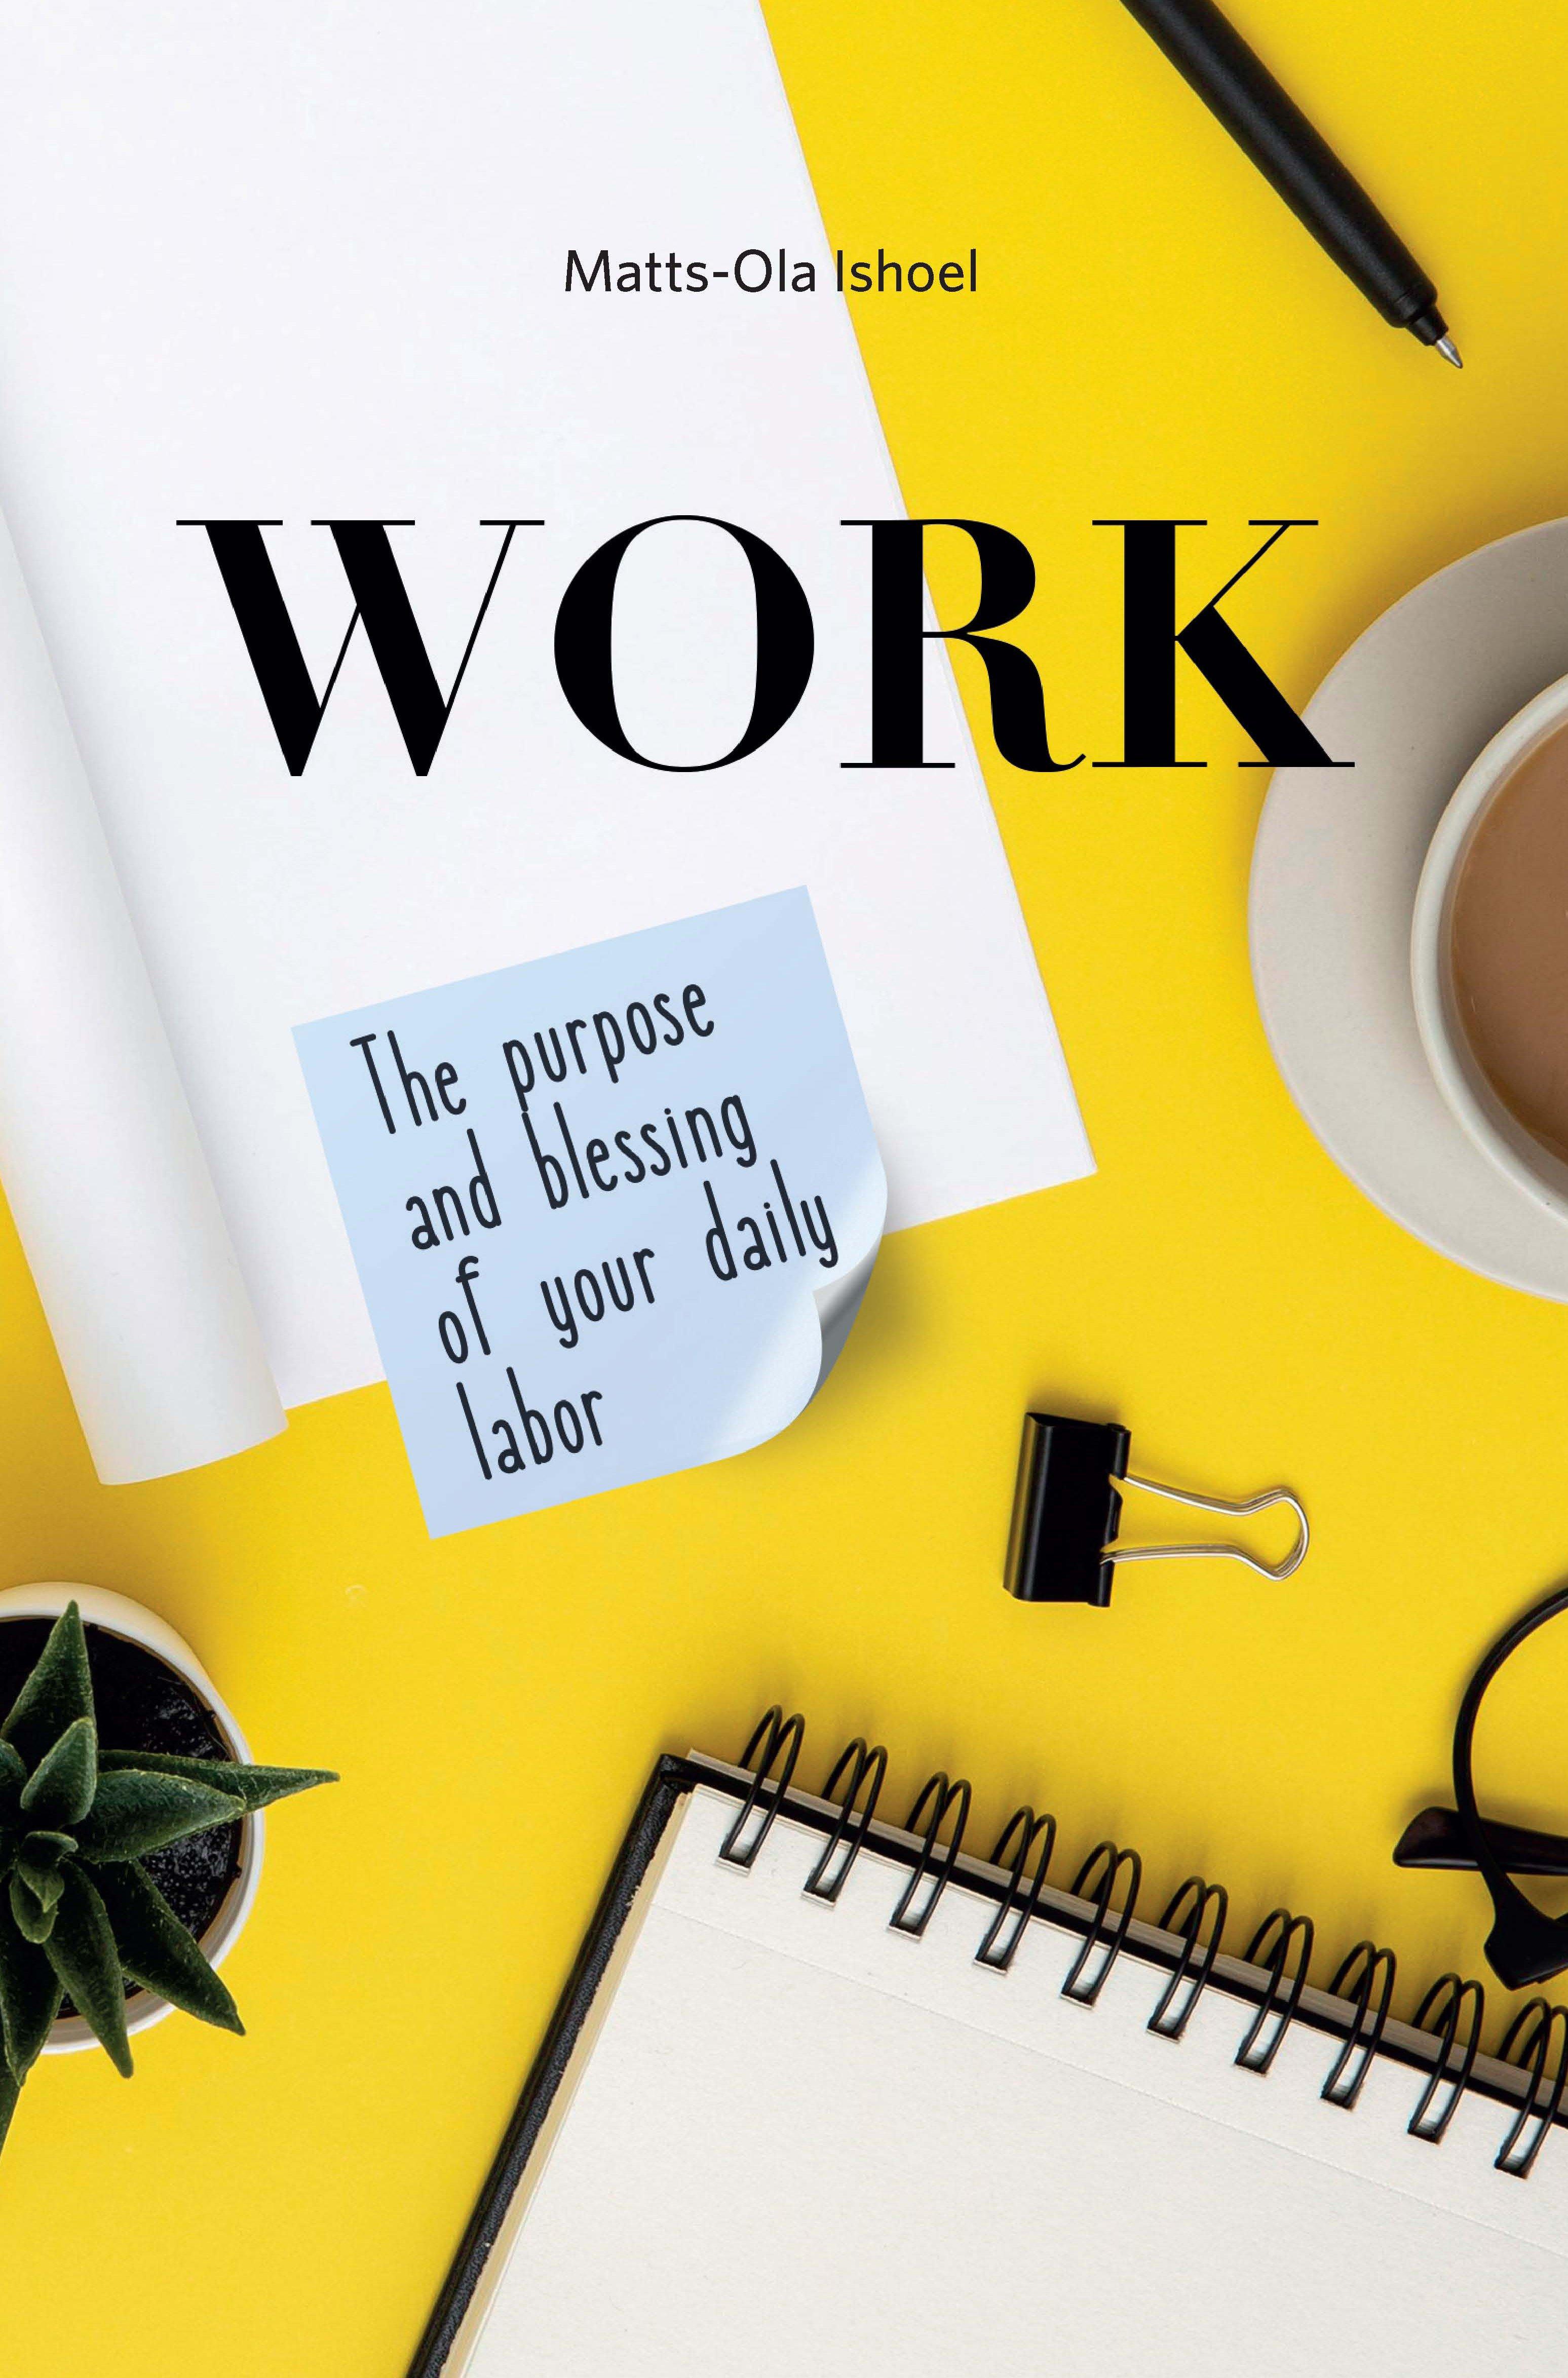 Купить книгу Work. The purpose and blessing of your daily labor, автора Маттса-Олы Исхоела